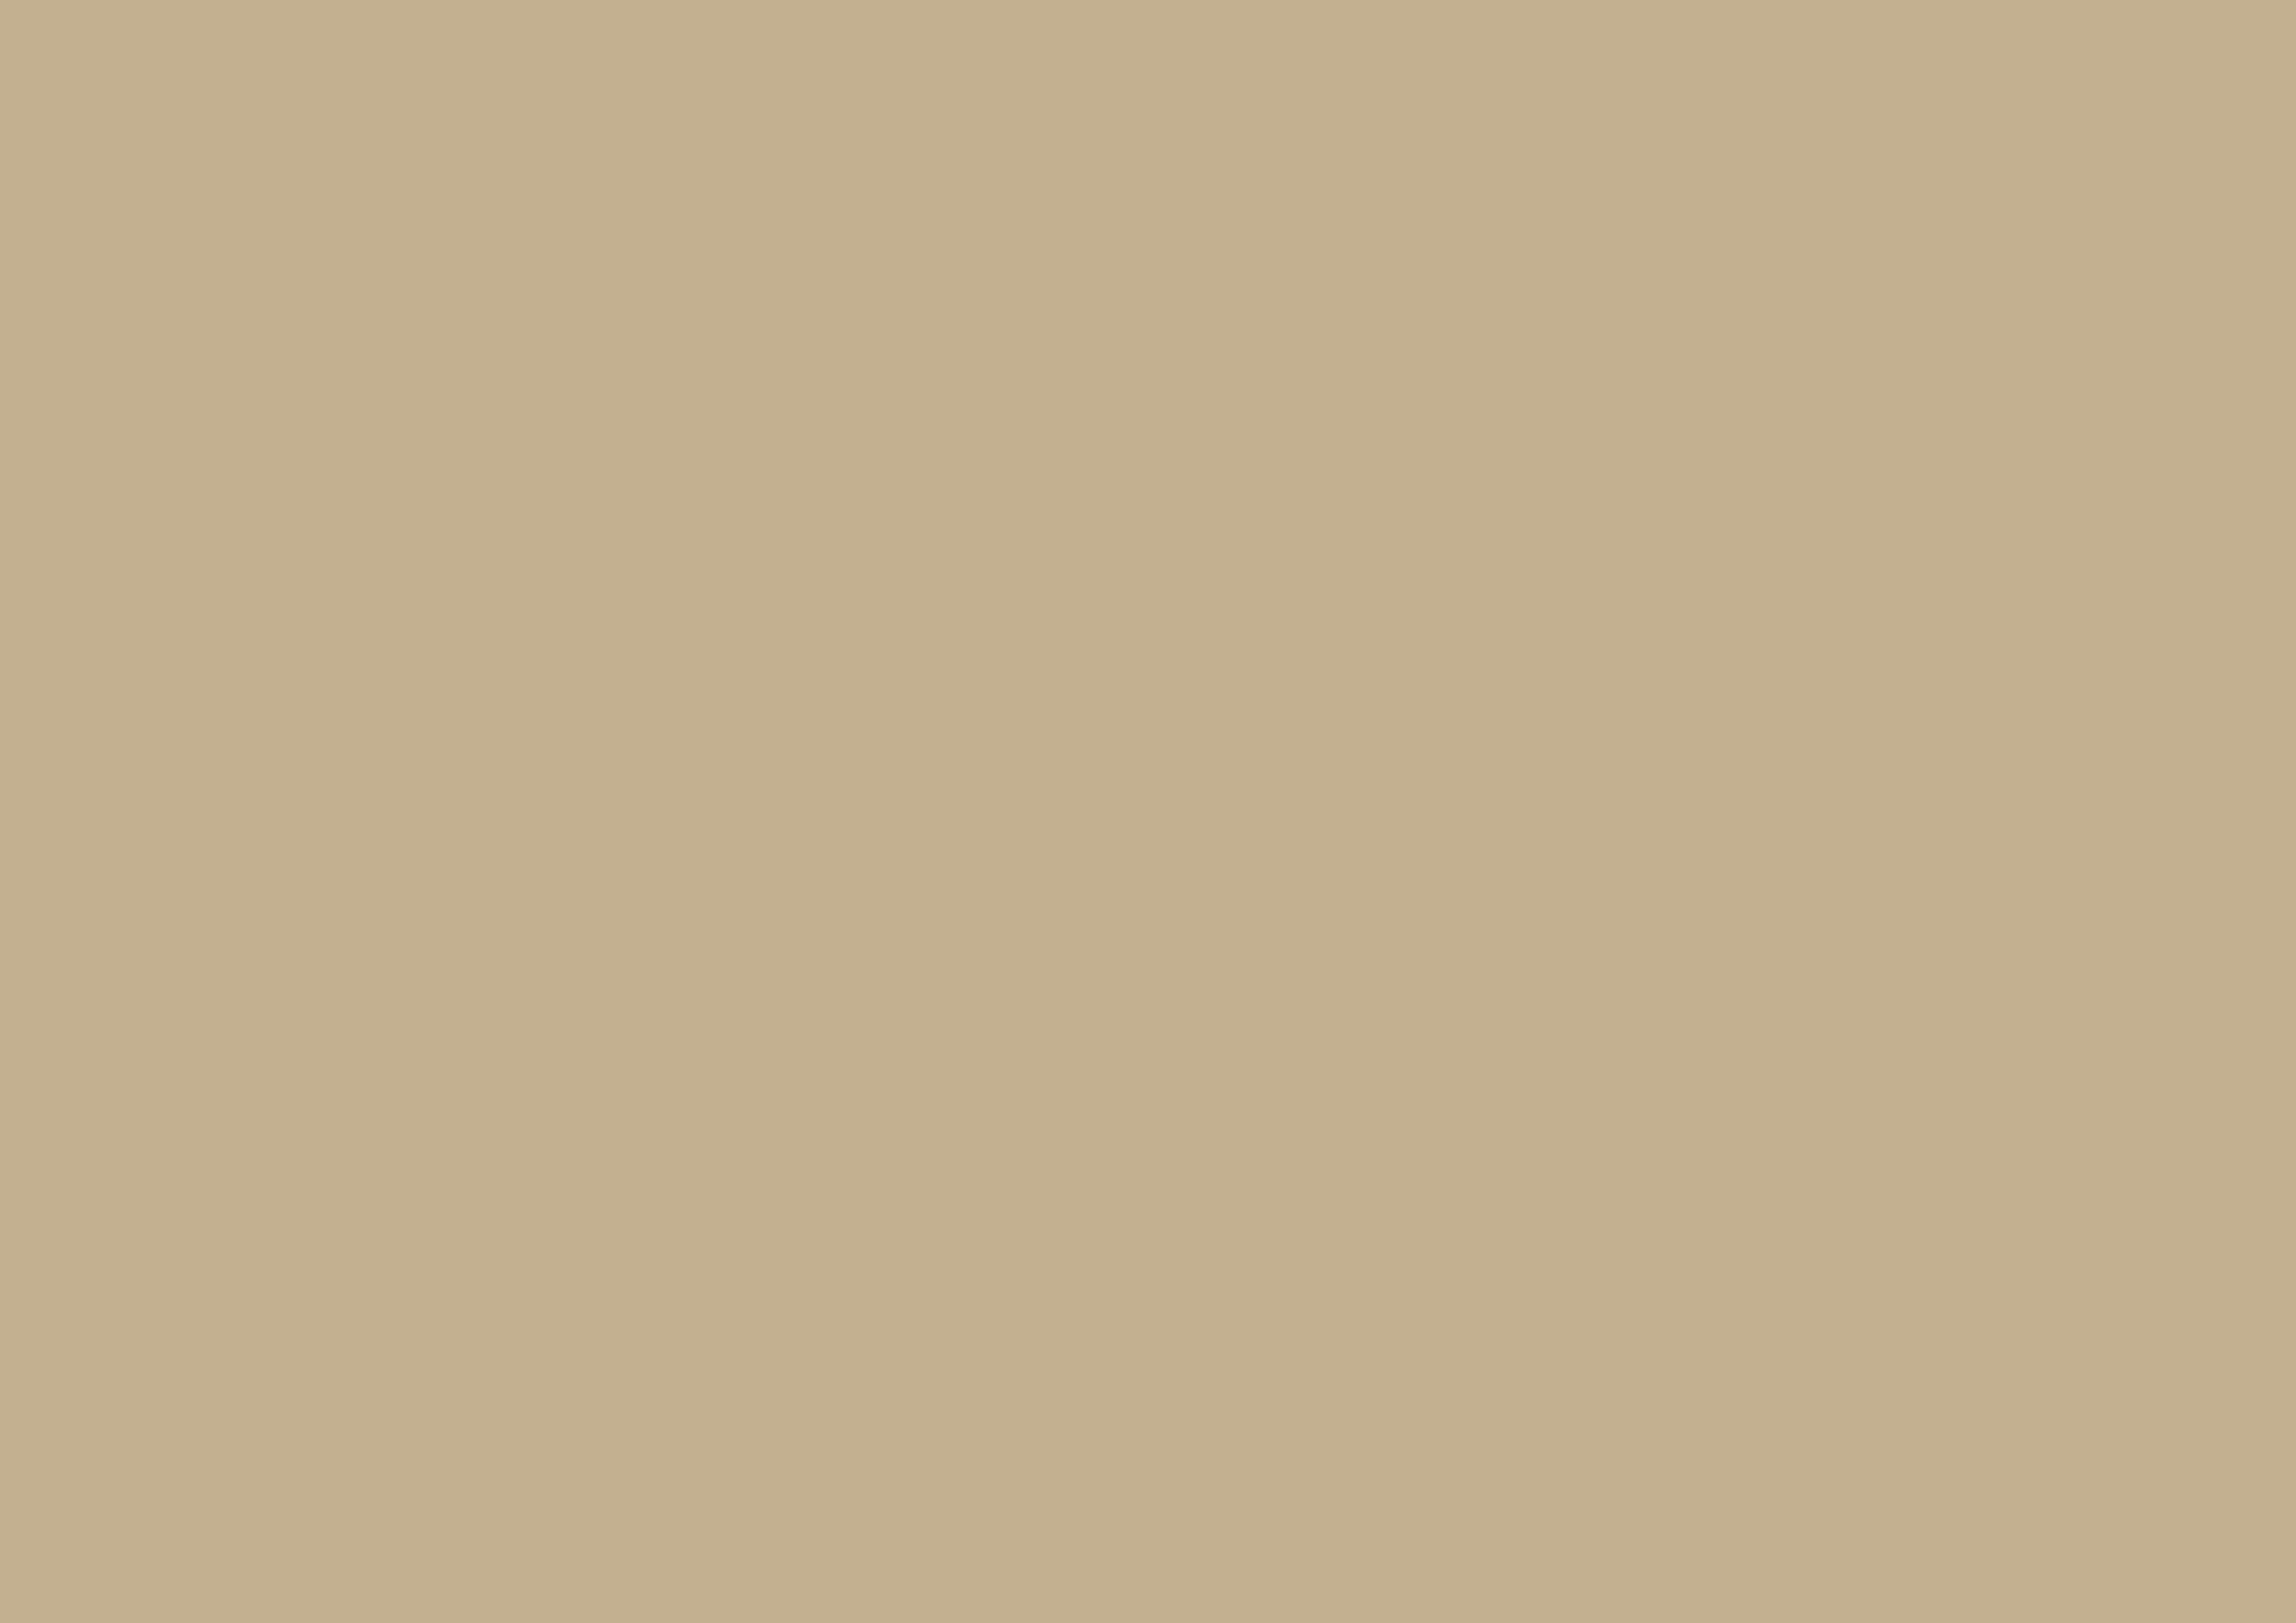 3508x2480 Khaki Web Solid Color Background